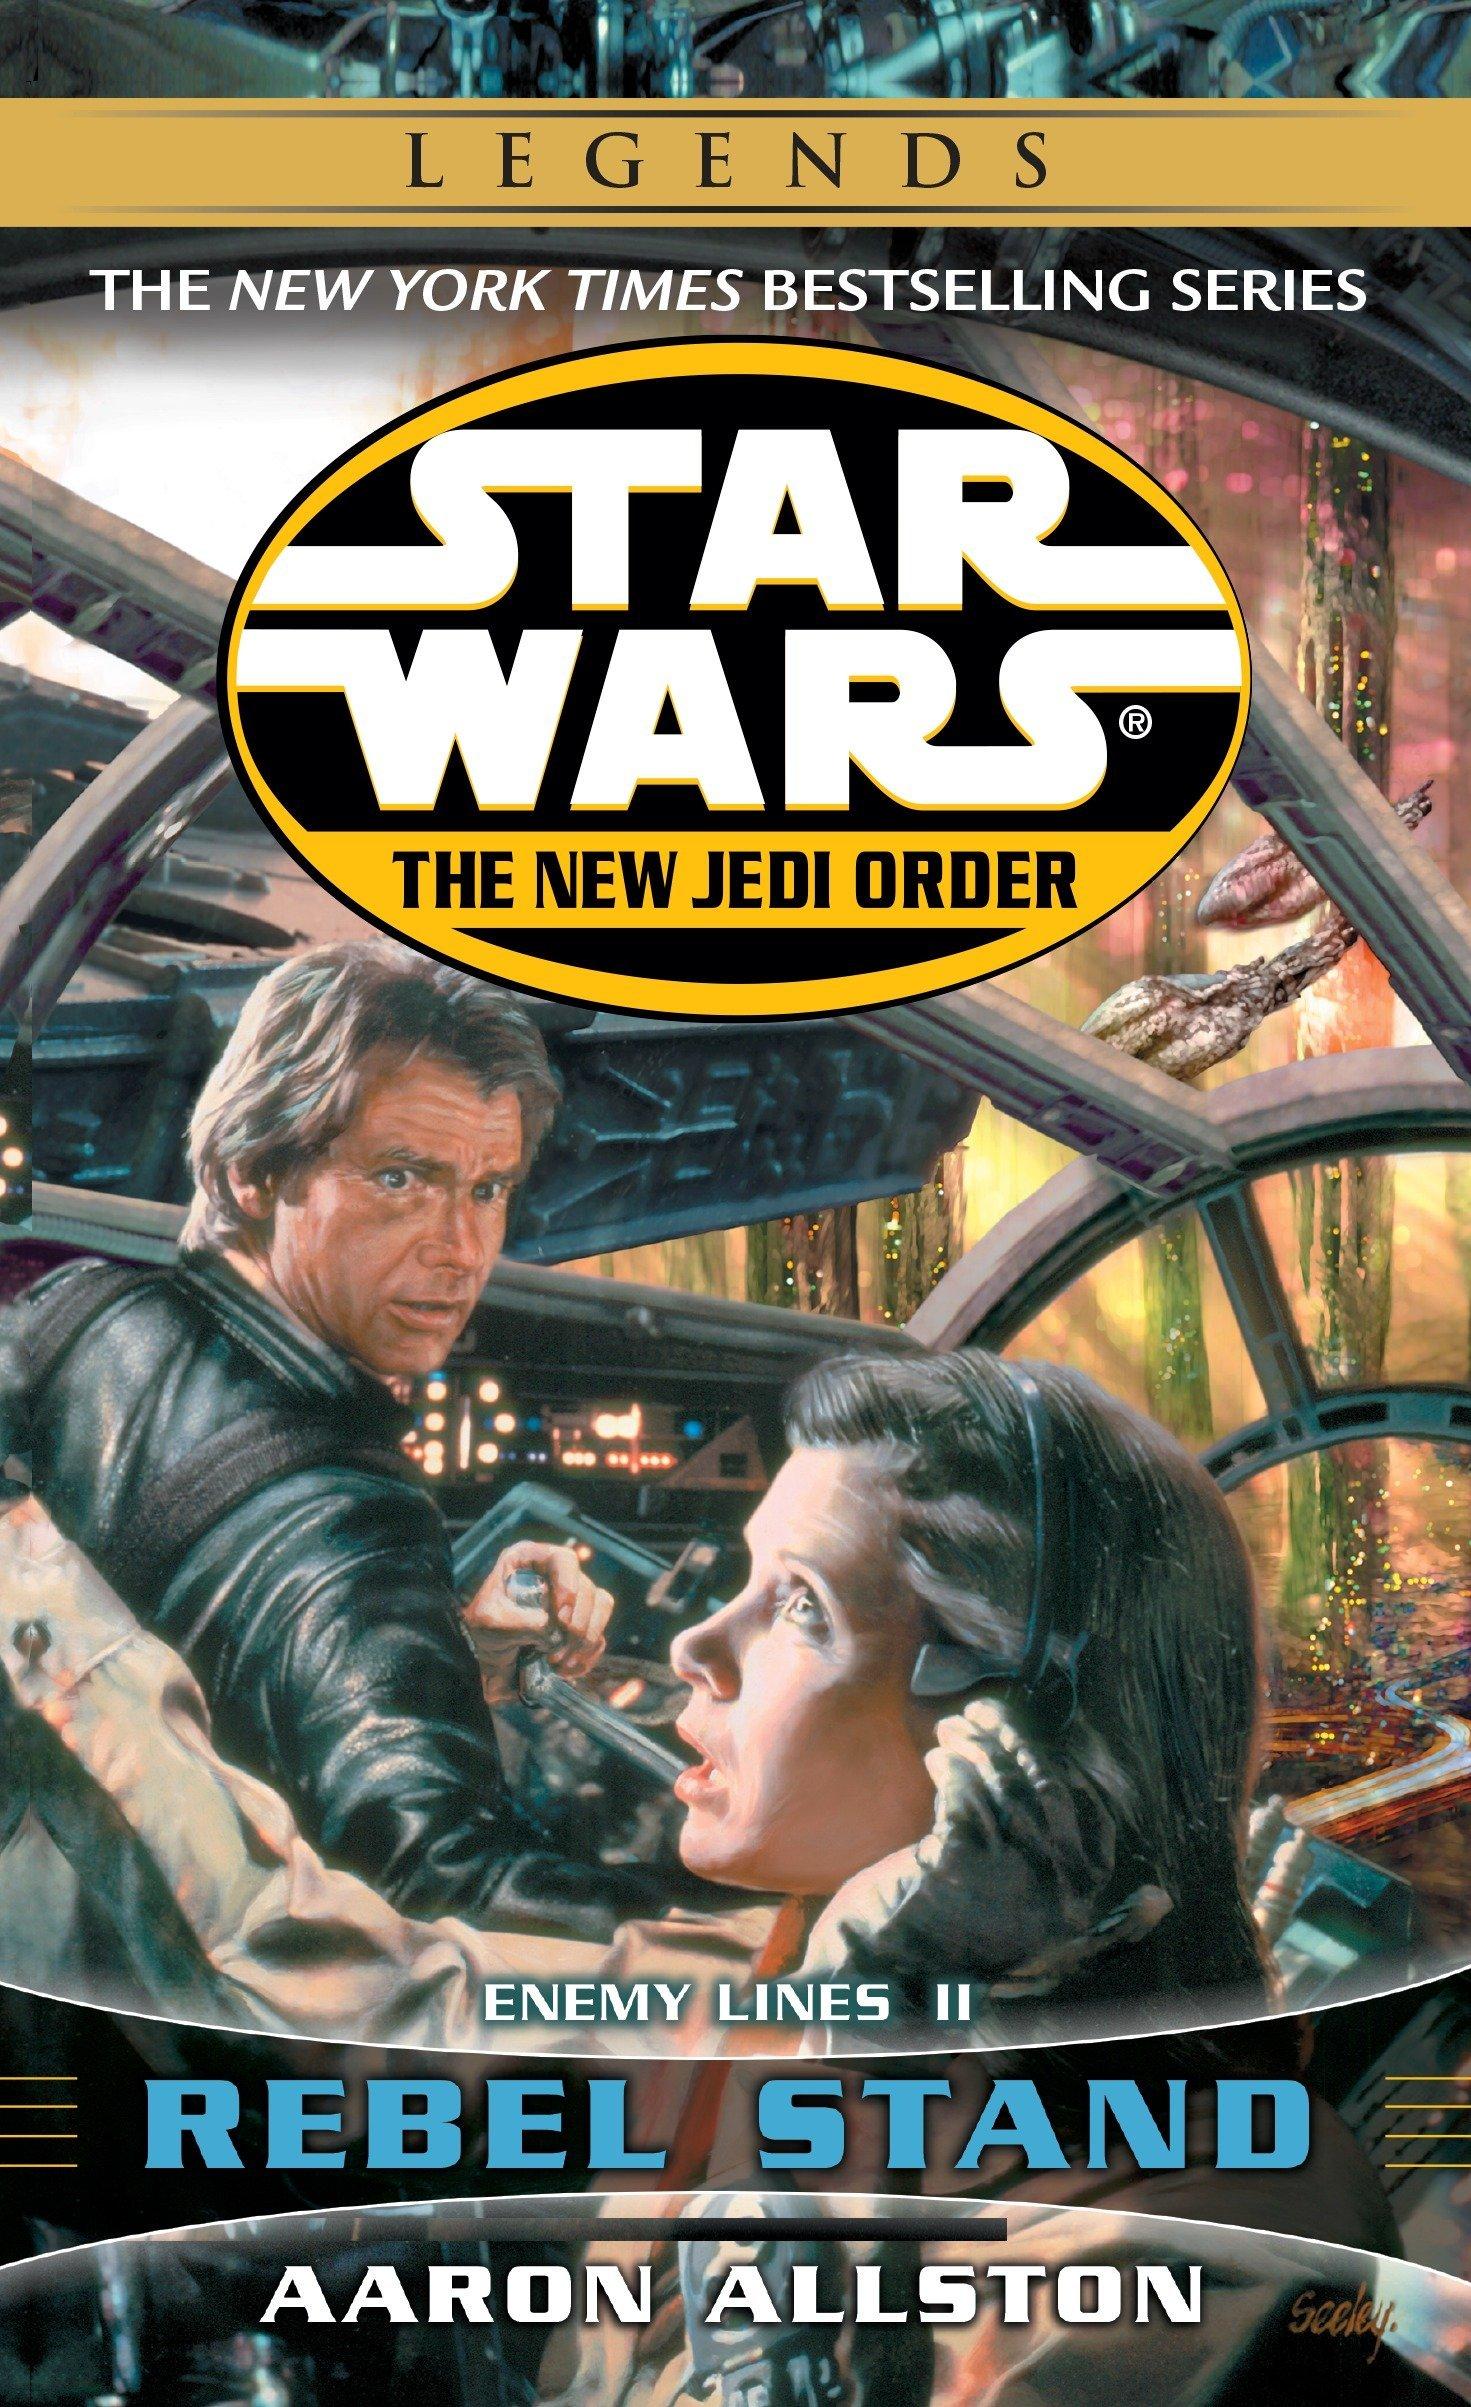 Rebel Stand: Star Wars Legends (The New Jedi Order): Enemy Lines II (Star Wars: The New Jedi Order - Legends, Band 12)